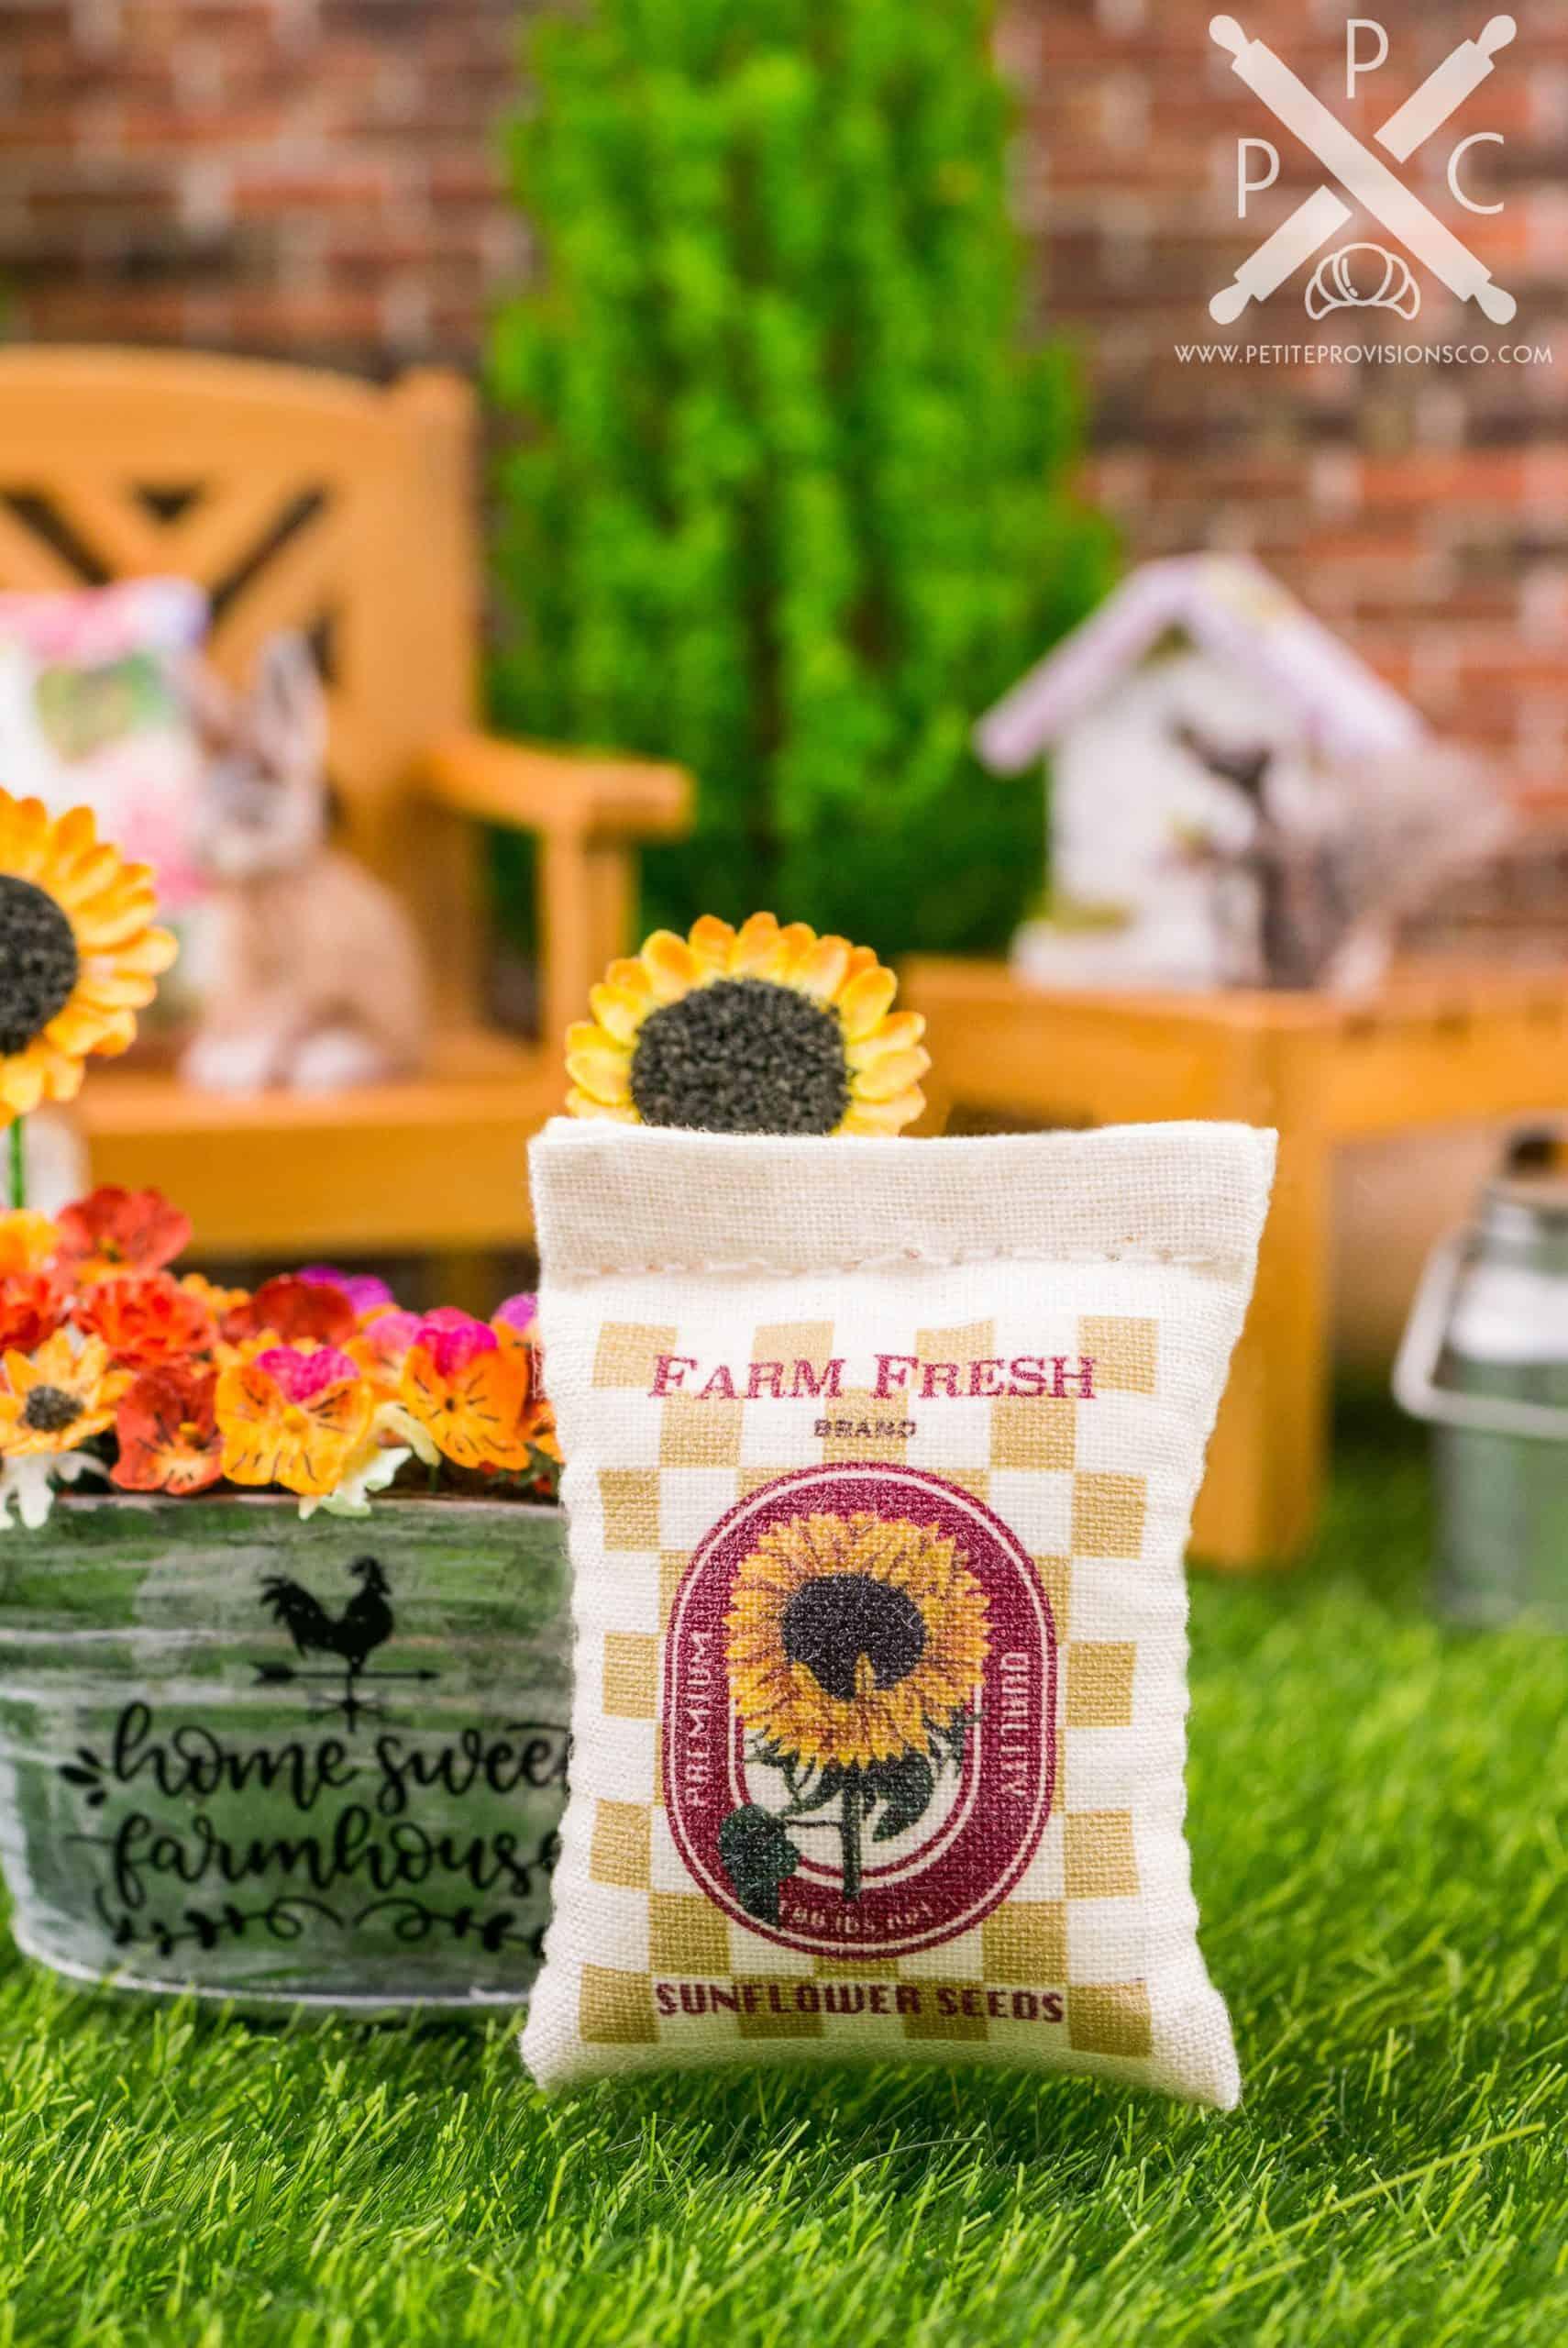 Farm Fresh Sunflower Seeds Bag